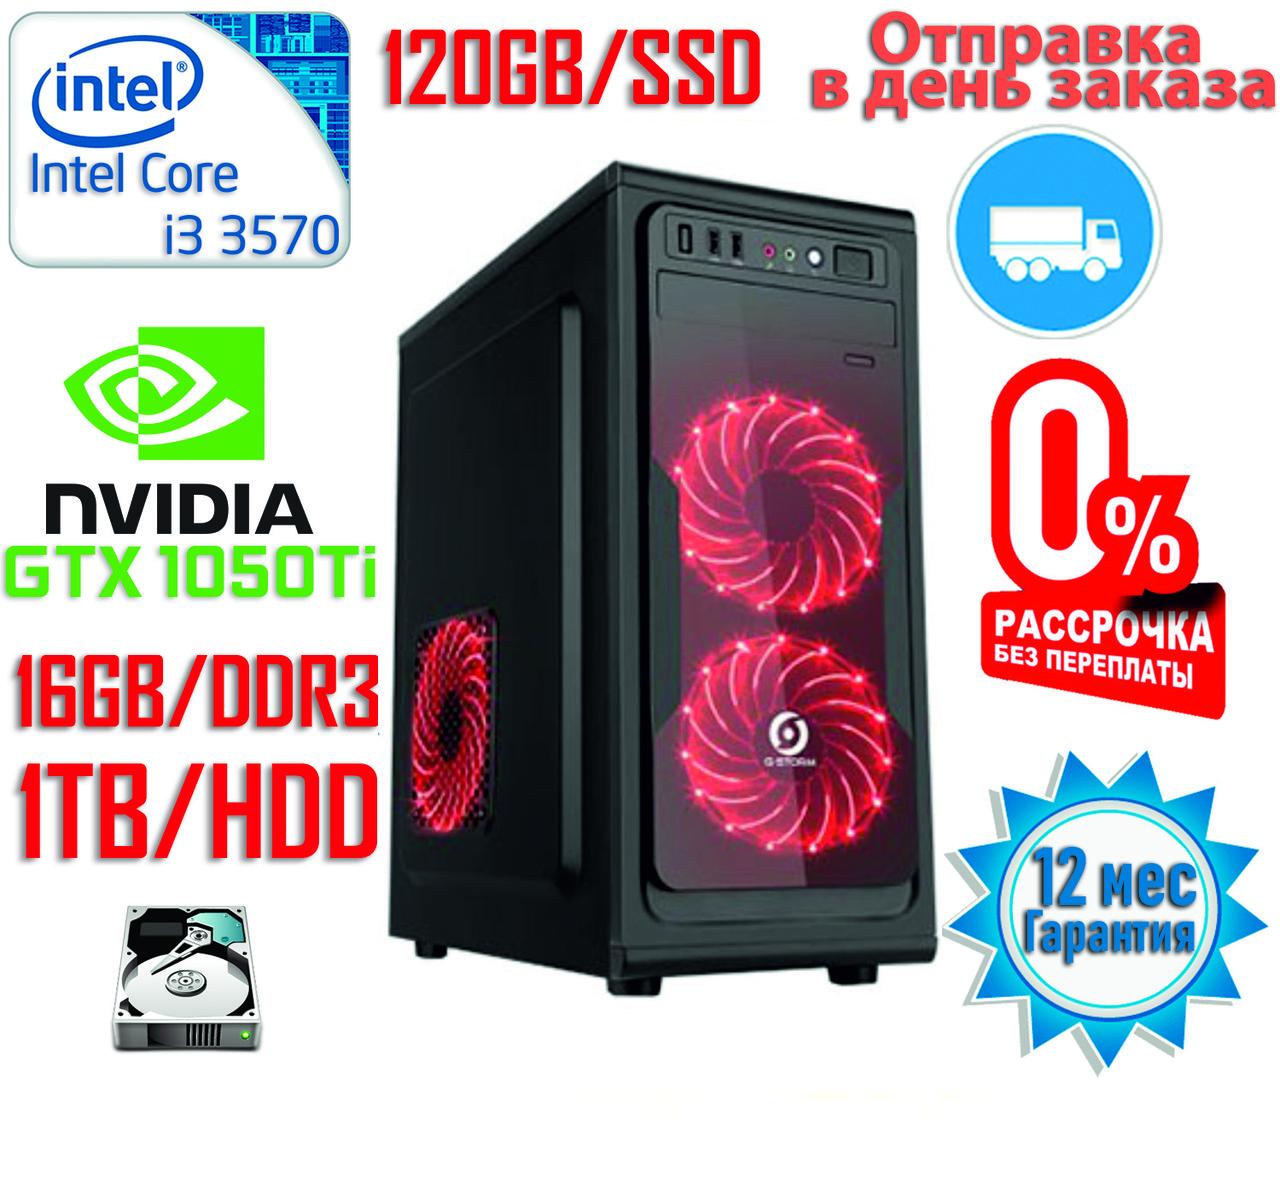 Игровой компьютер Intel Core i5 4-ядра 3.4GHz /DDR3-16Gb/SSD-120GbHDD-1Tb/GTX1050Ti   РАССРОЧКА 